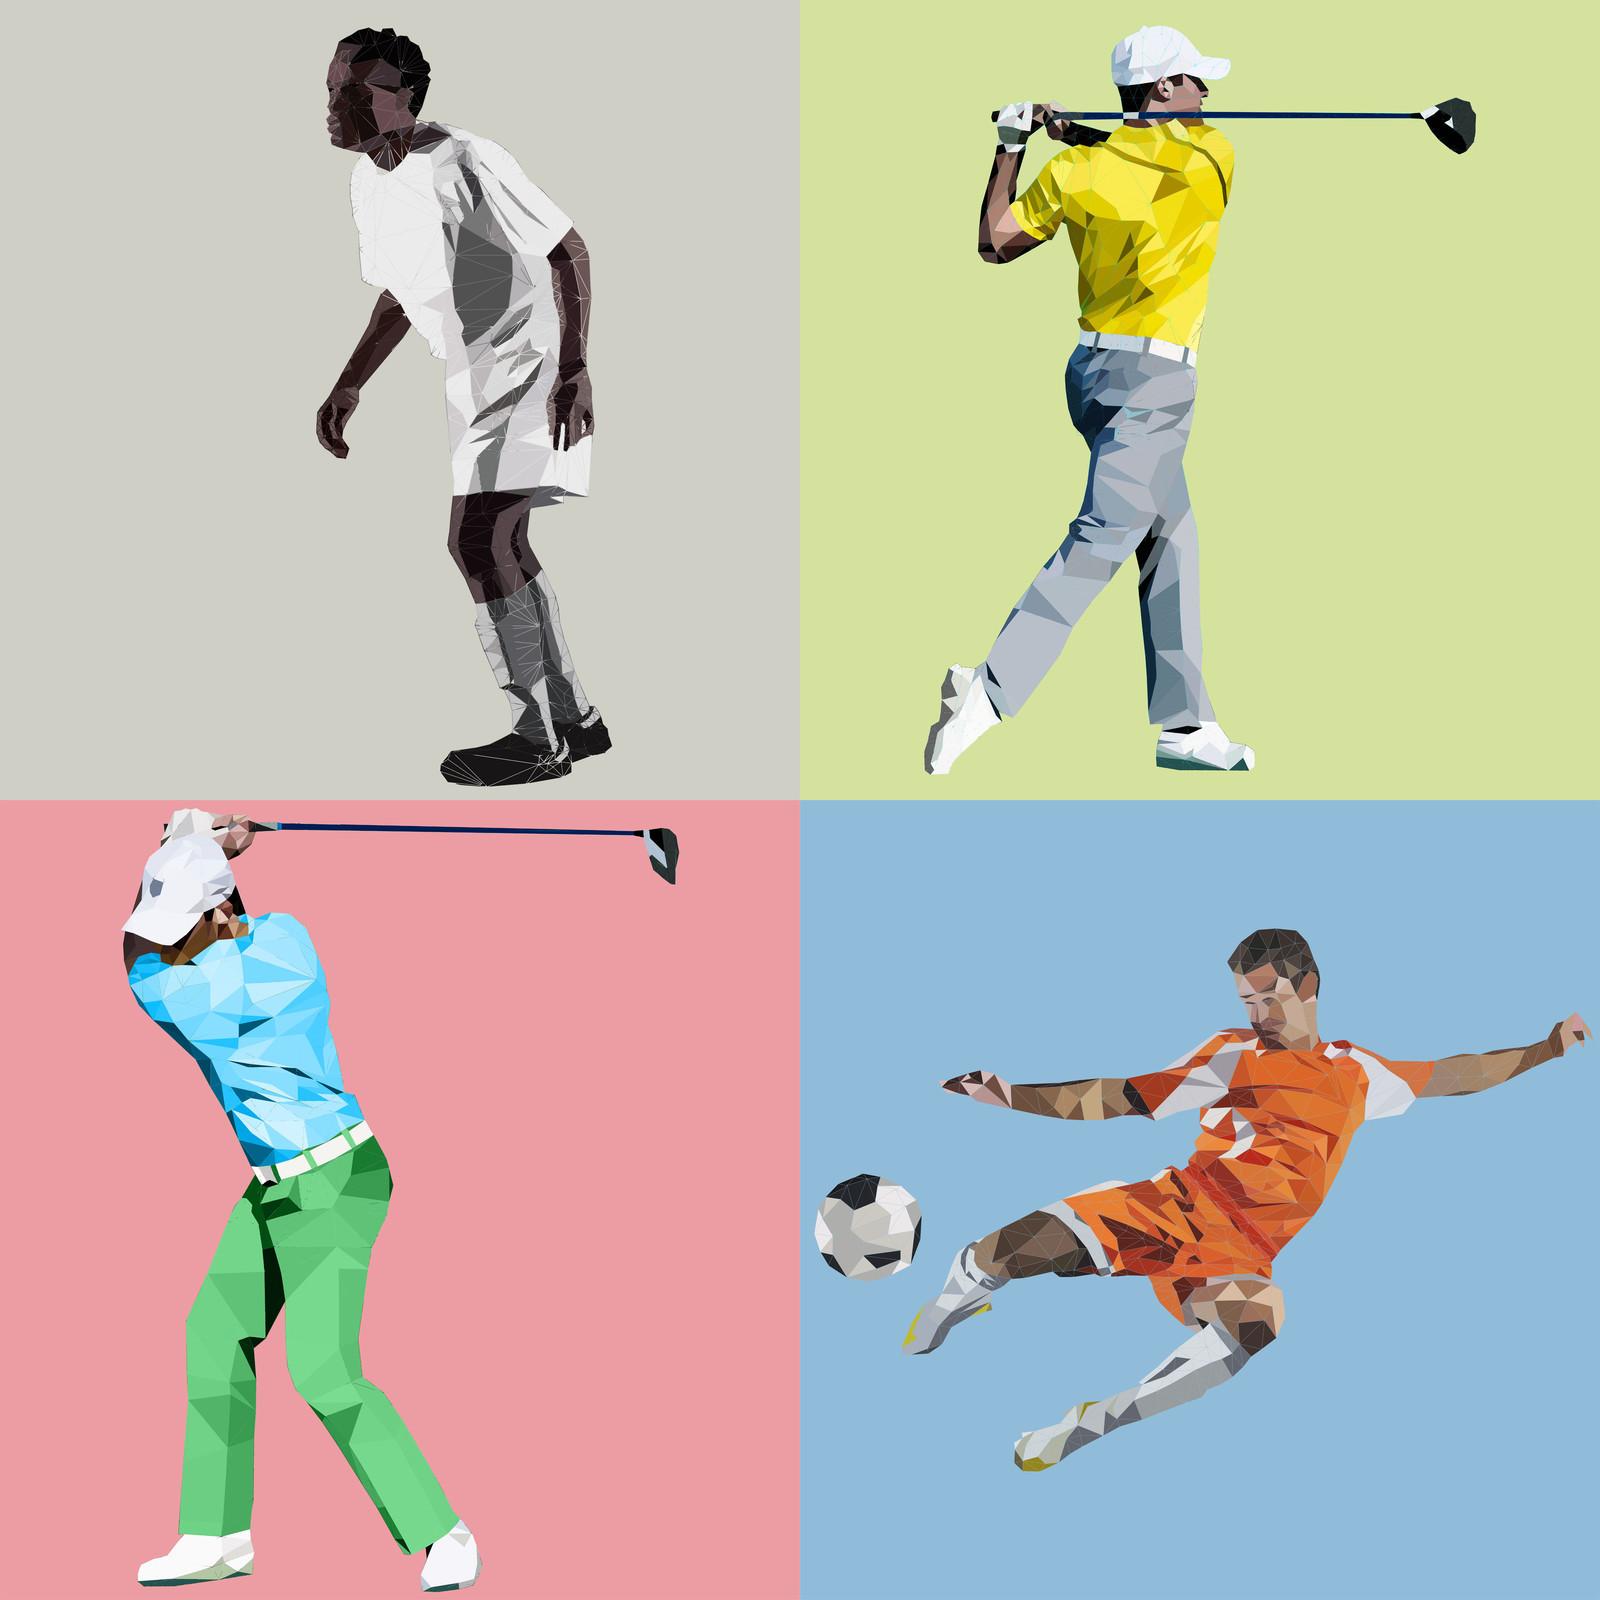 WIRED & Microsoft: Sport Innovation (illustrations)